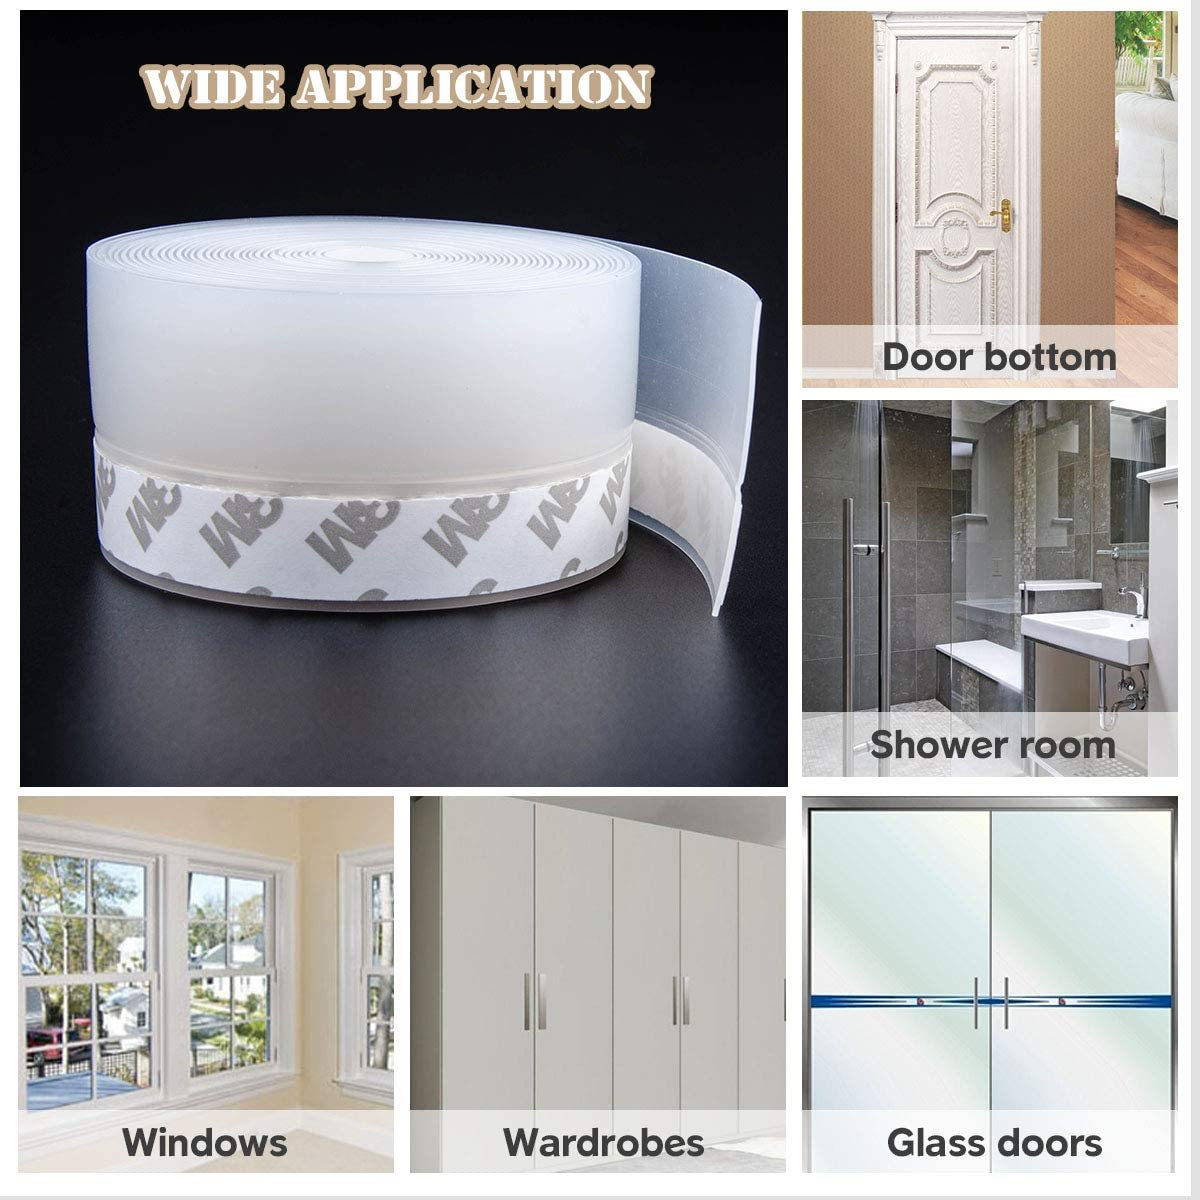 Shower Door Seal Strip Transparent,16.5Ft Long X 1.77 Inch Width Self Adhesive Doors and Windows Weather Stripping Glass Shower Door Bottom Seal Strip